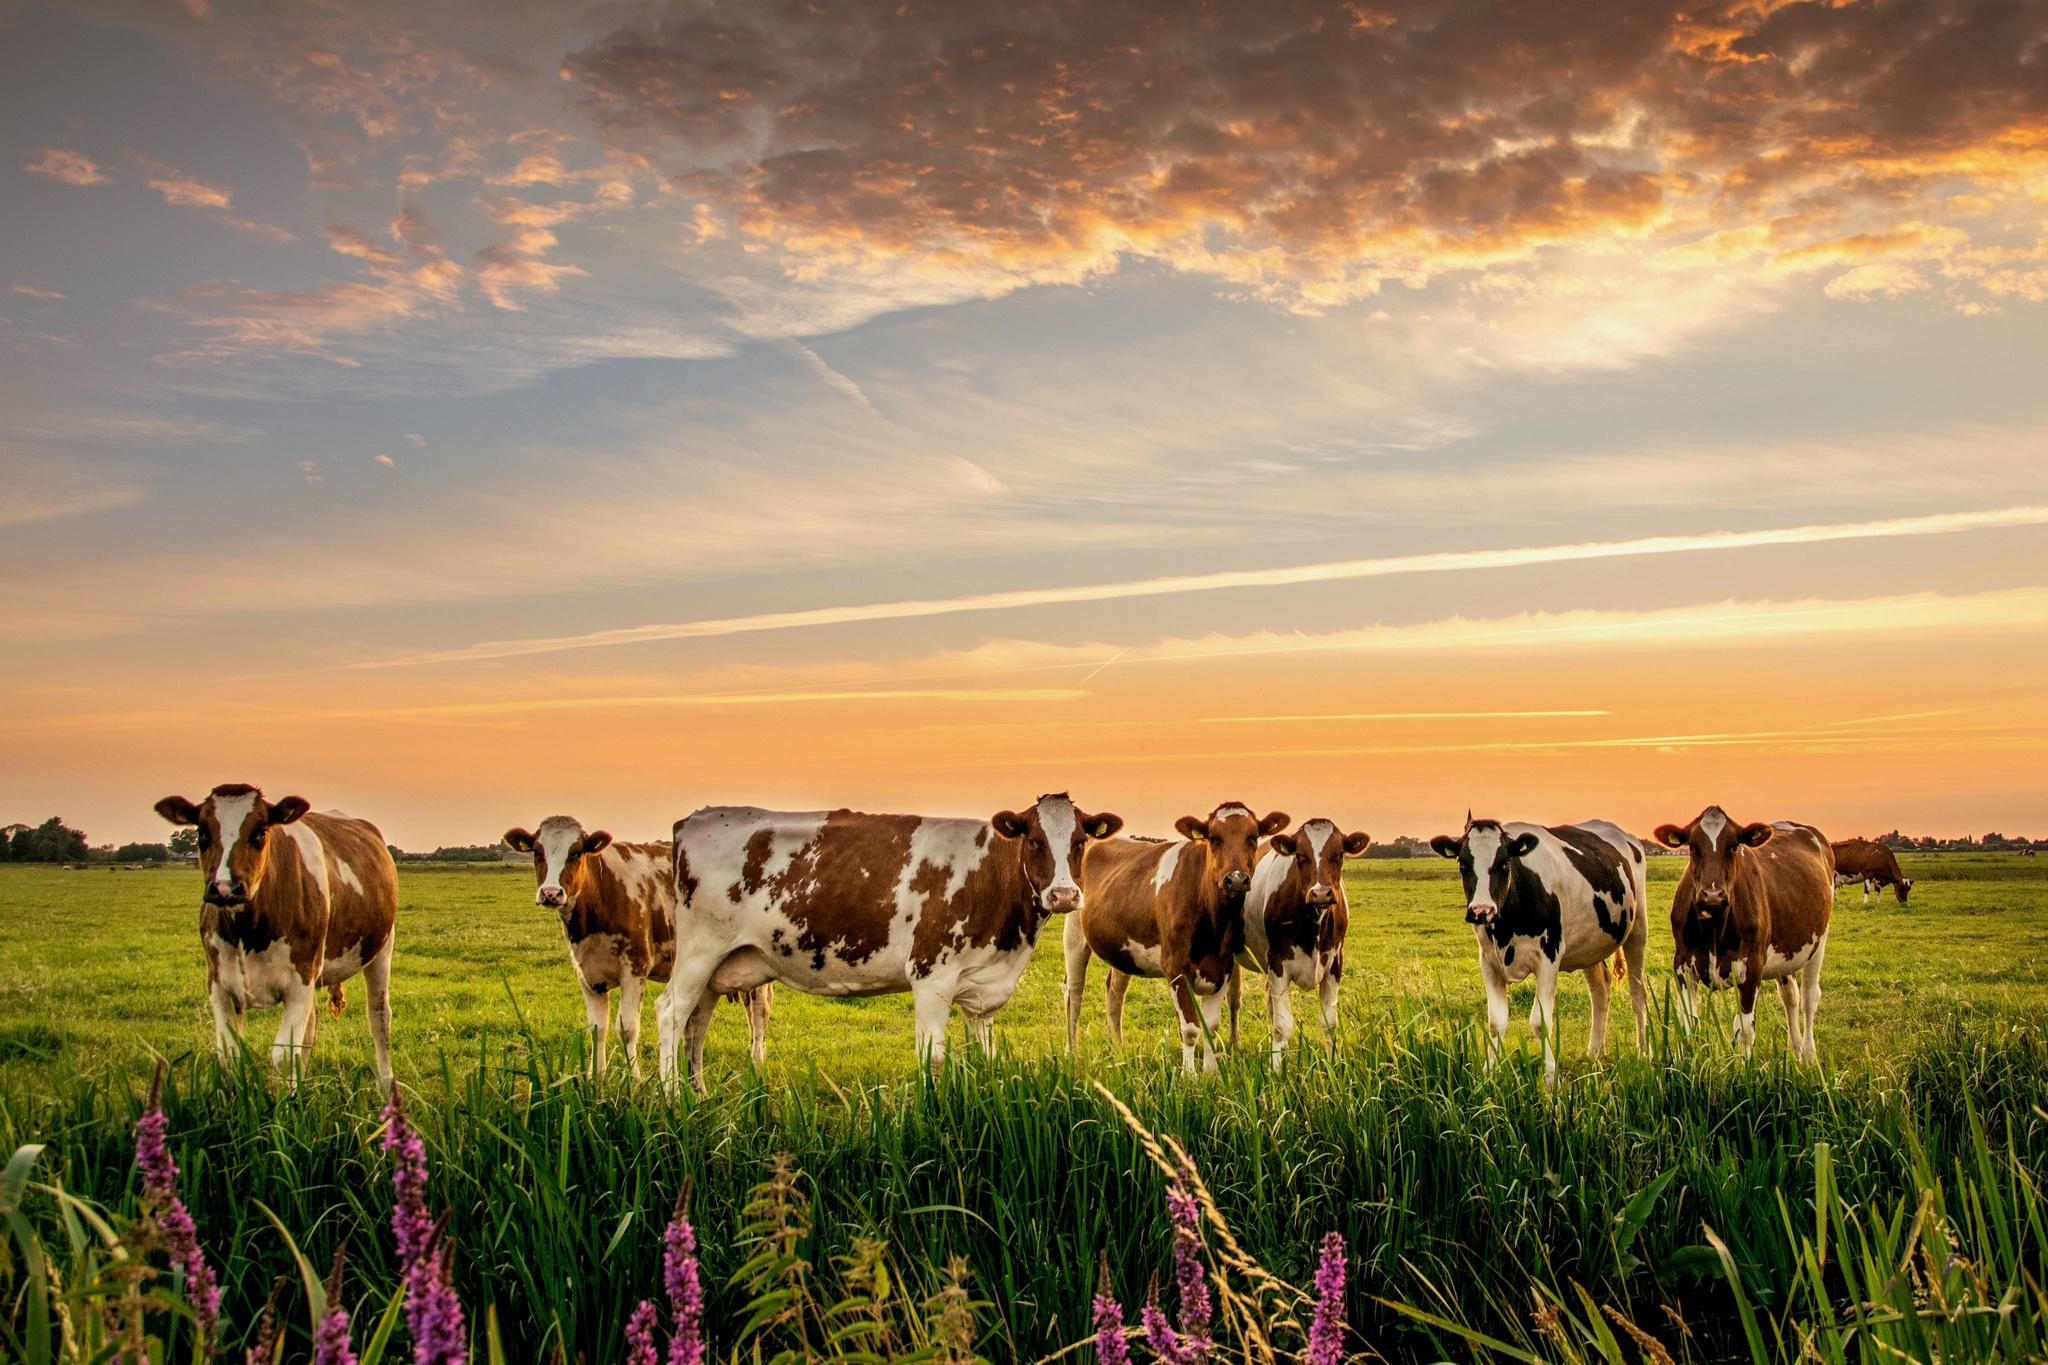 картинки коровы и лошади на лугу так как сайт